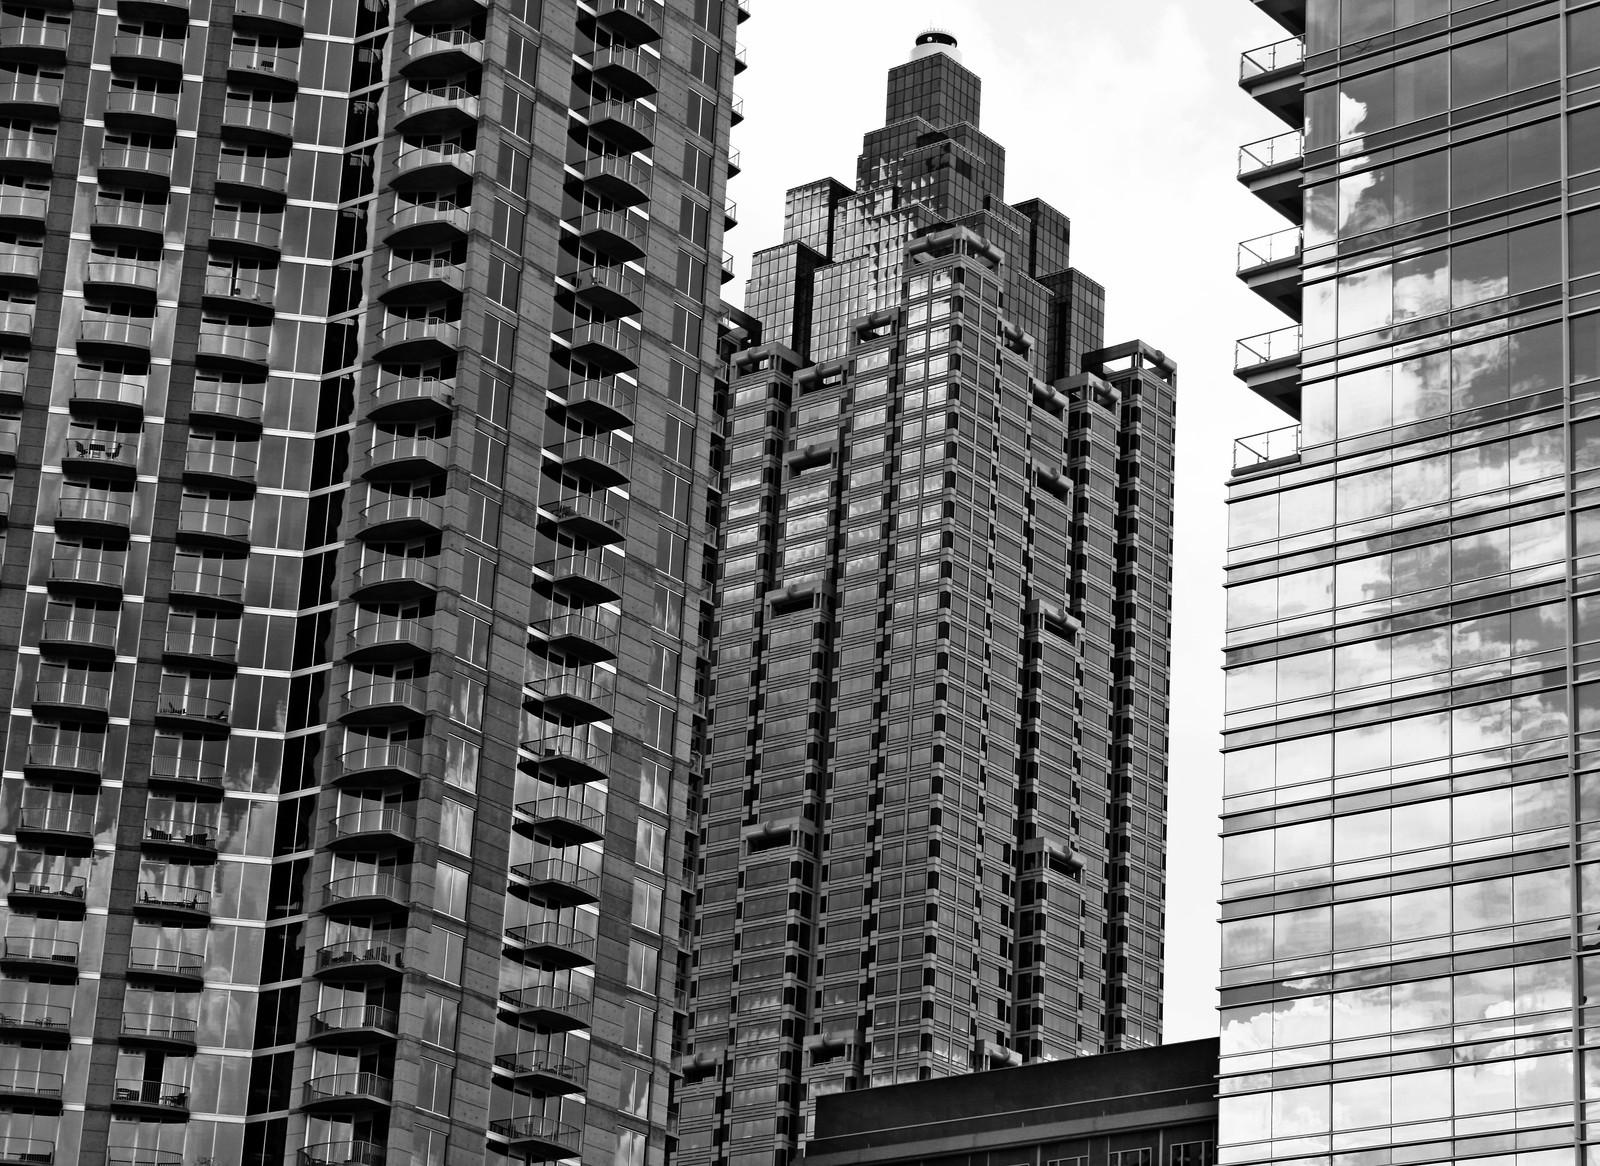 12 Centennial Park Hotel, Suntrust Building, W Hotel, Atlanta, June 2013